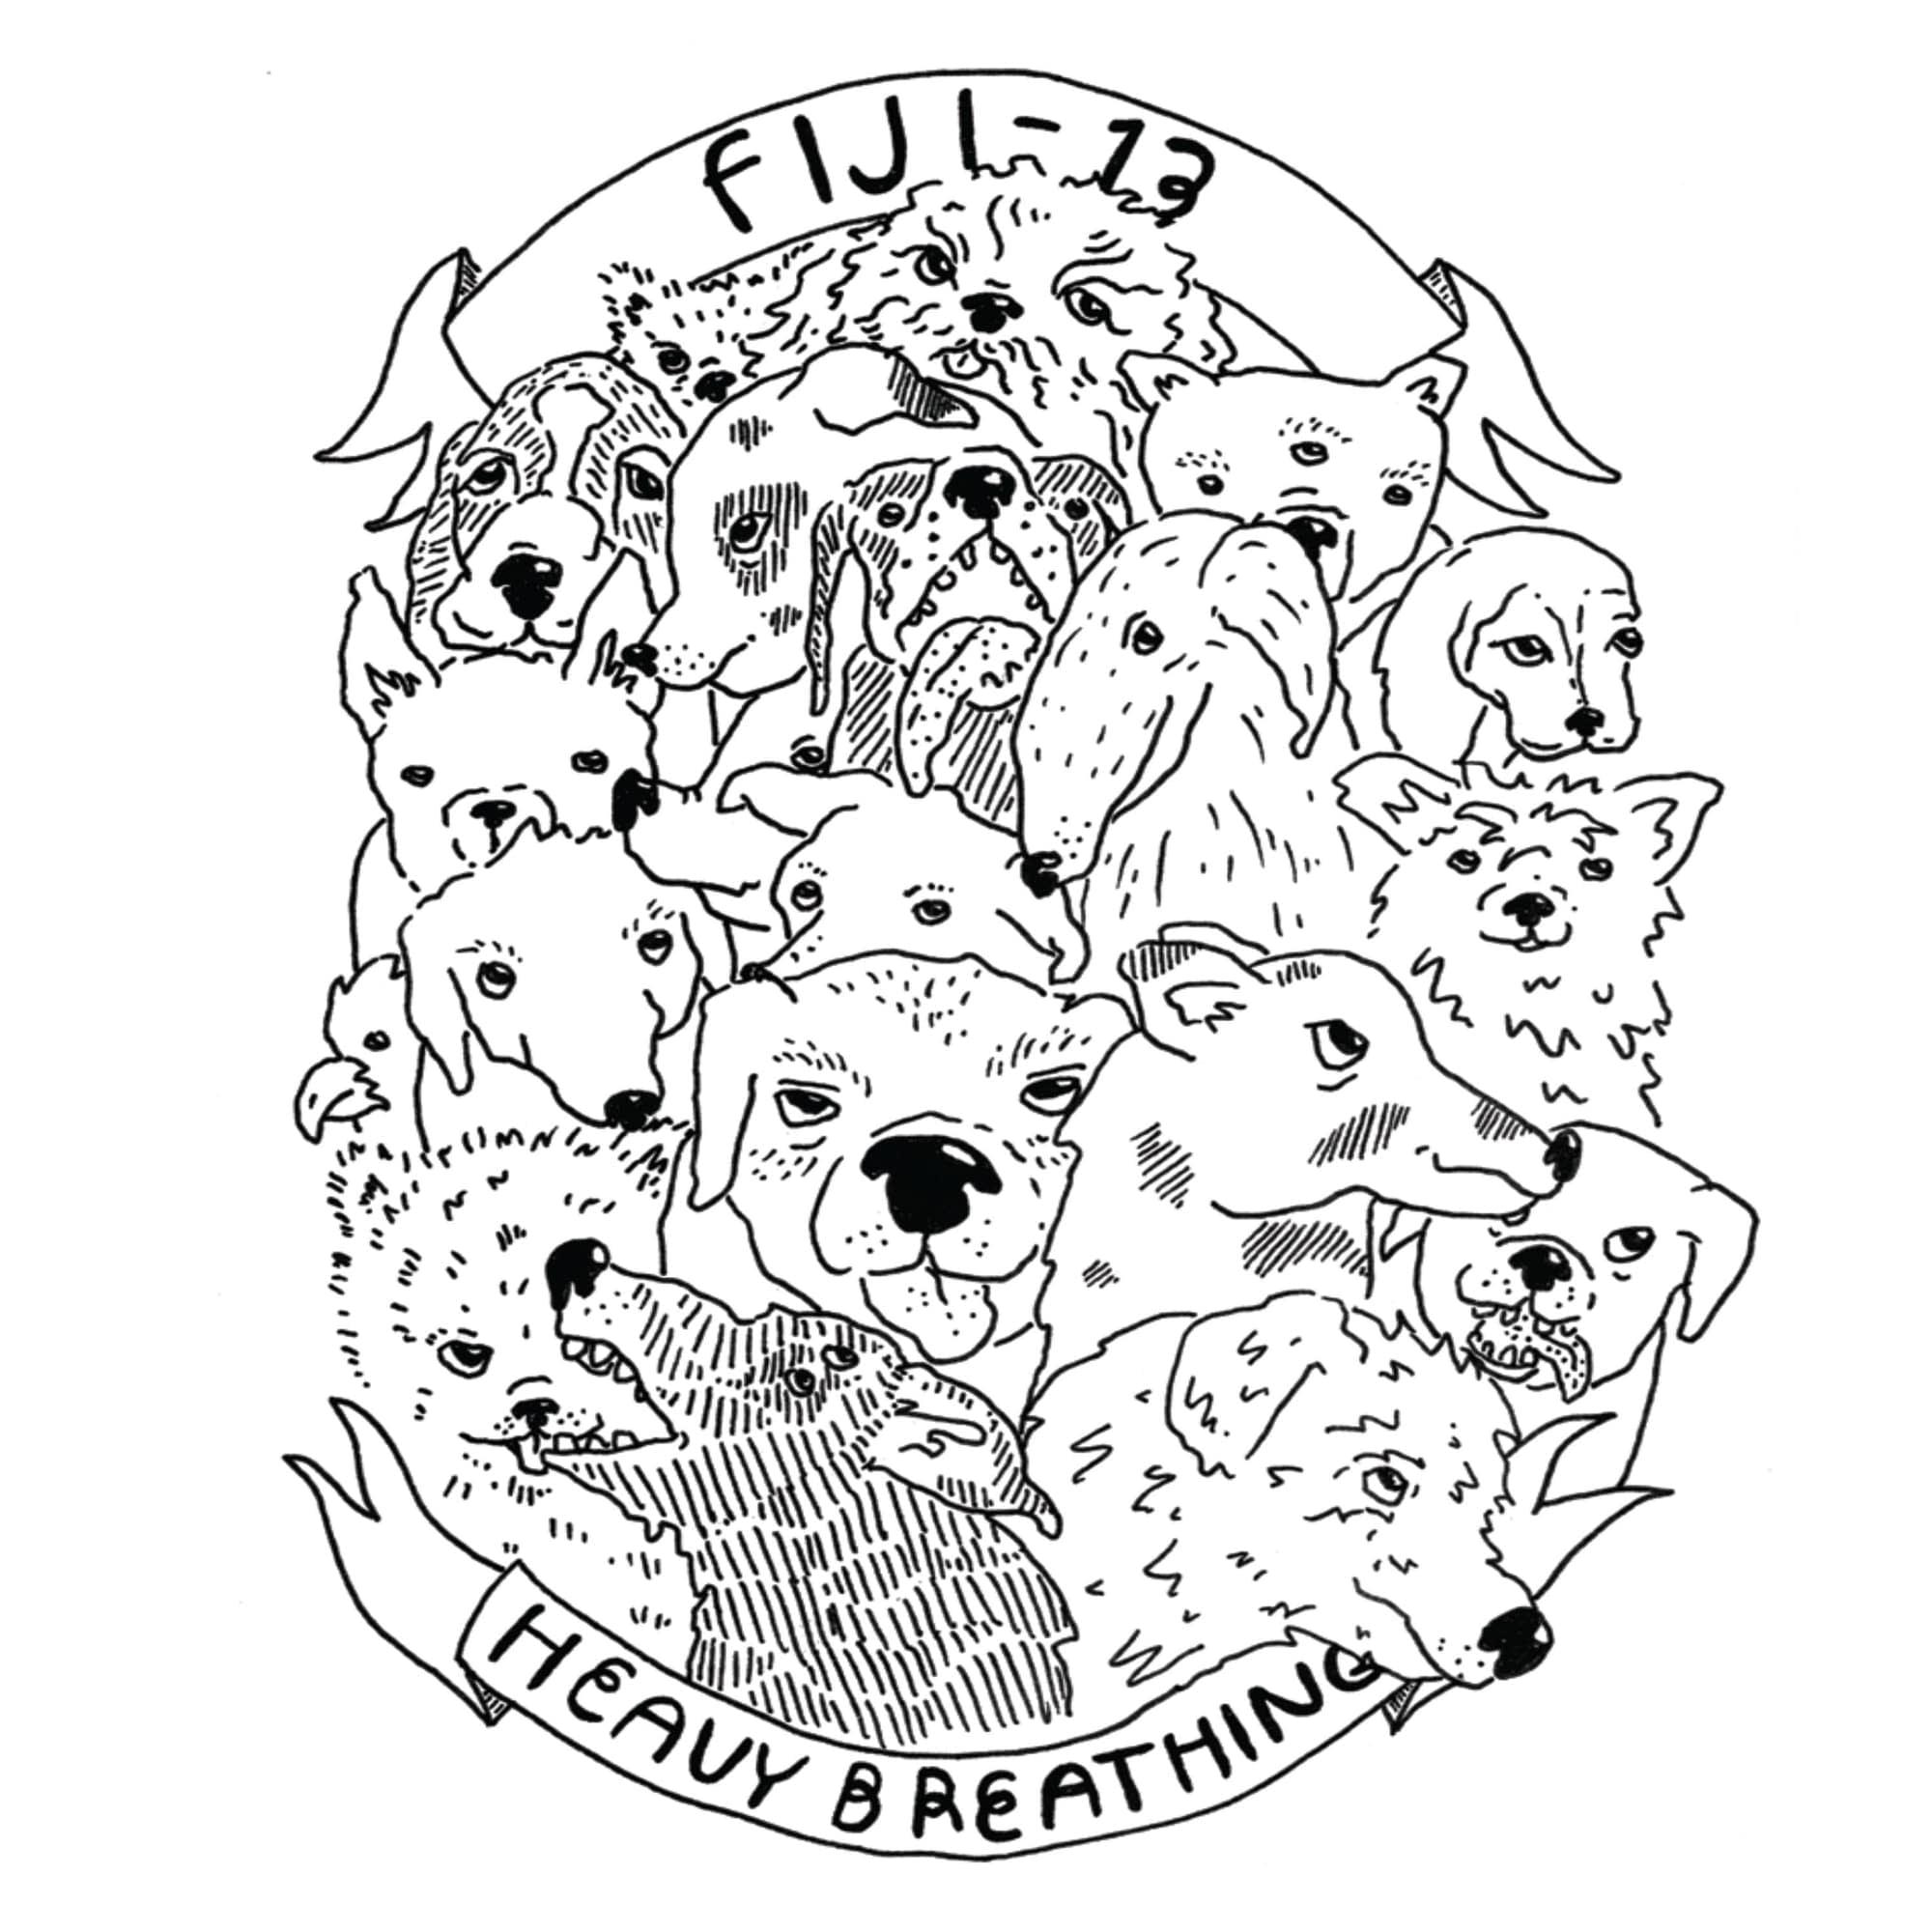 FIJI-13 'Heavy Breathing' cover art